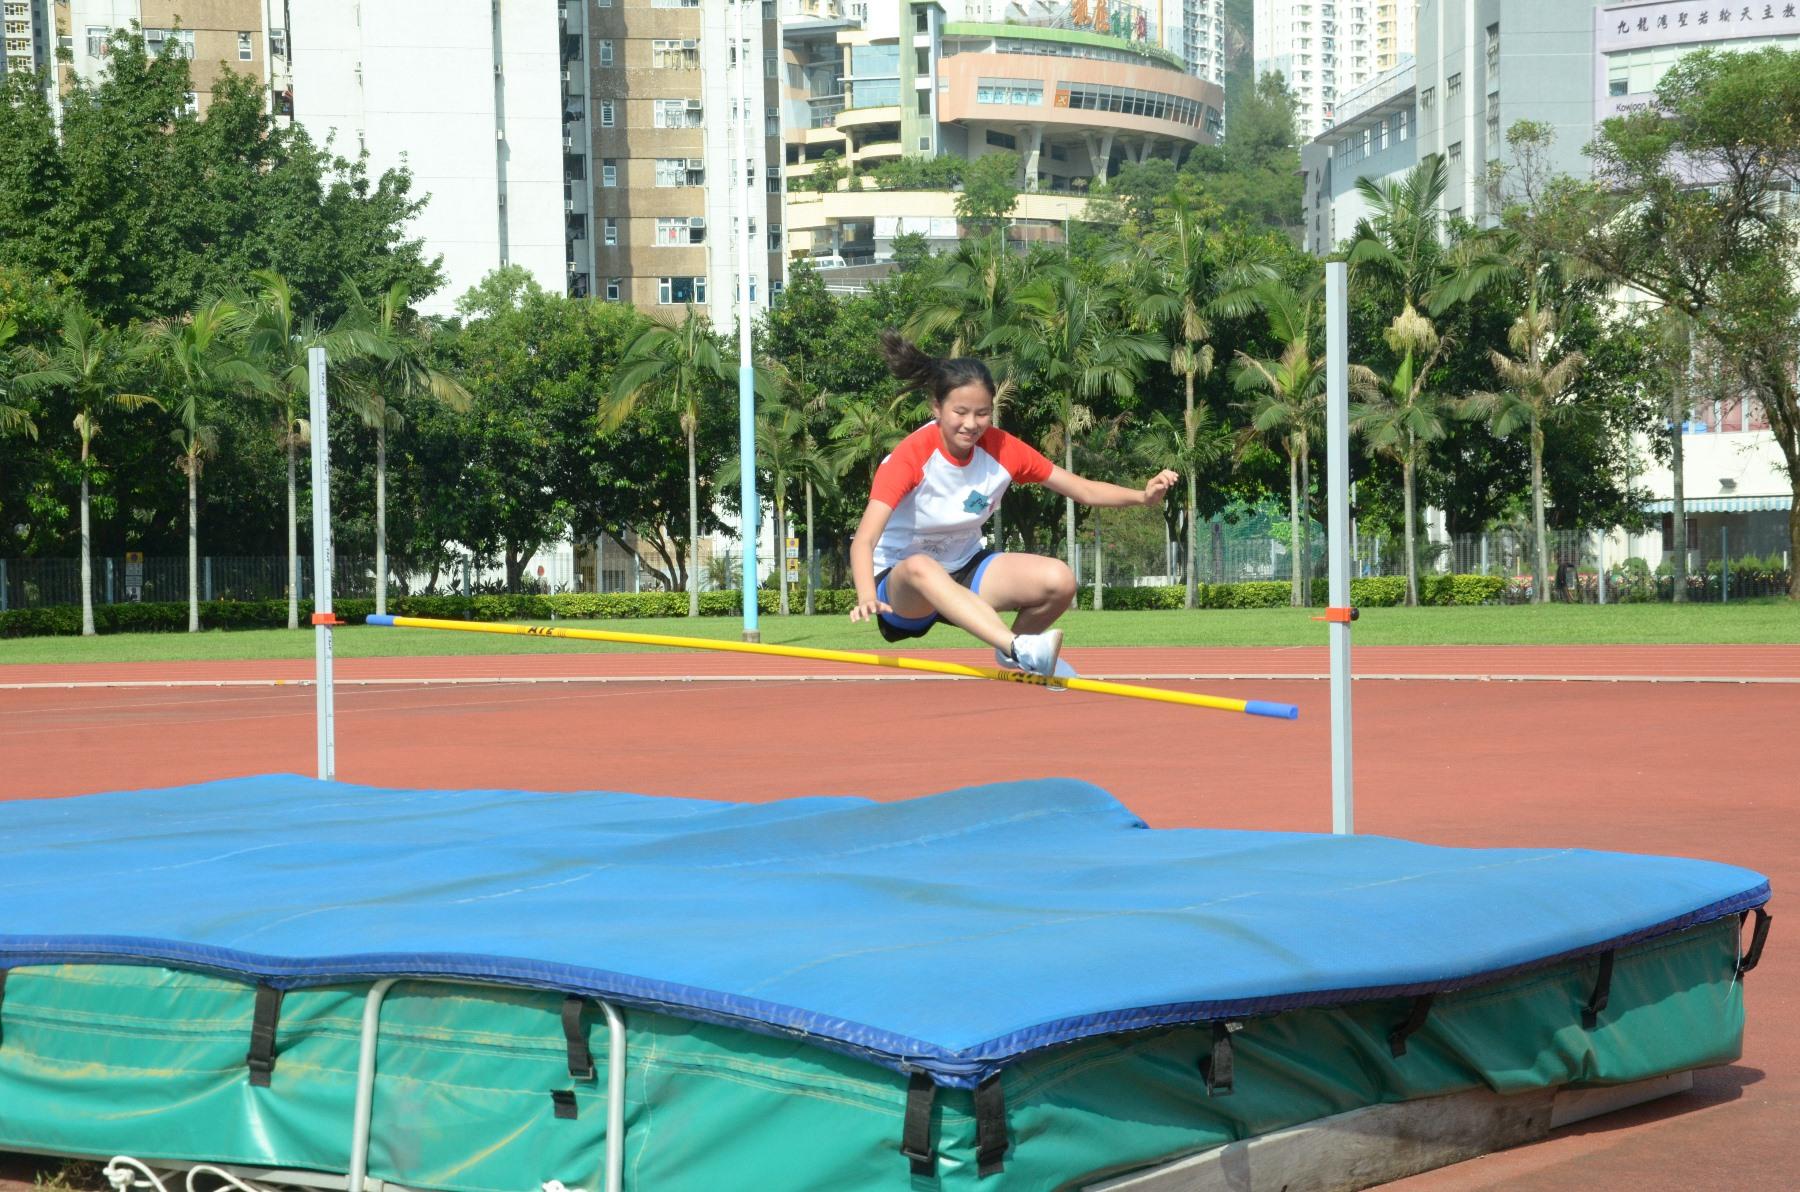 http://www.npc.edu.hk/sites/default/files/dsc_8320.jpg